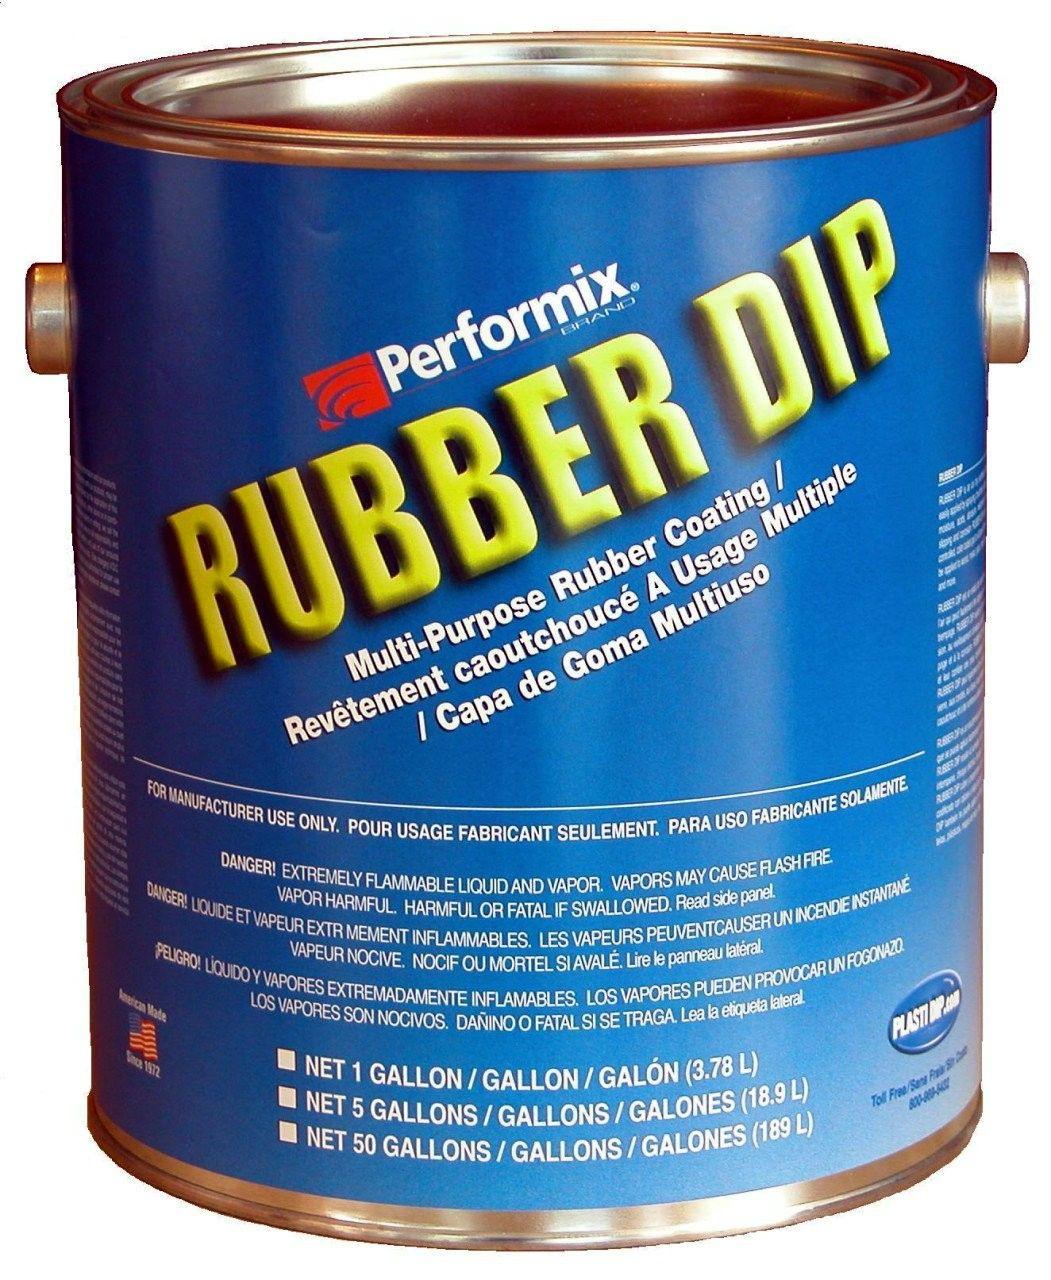 Plasti Dip Spray, 1 Gallon Can, Standard Colors | Plasti Dip